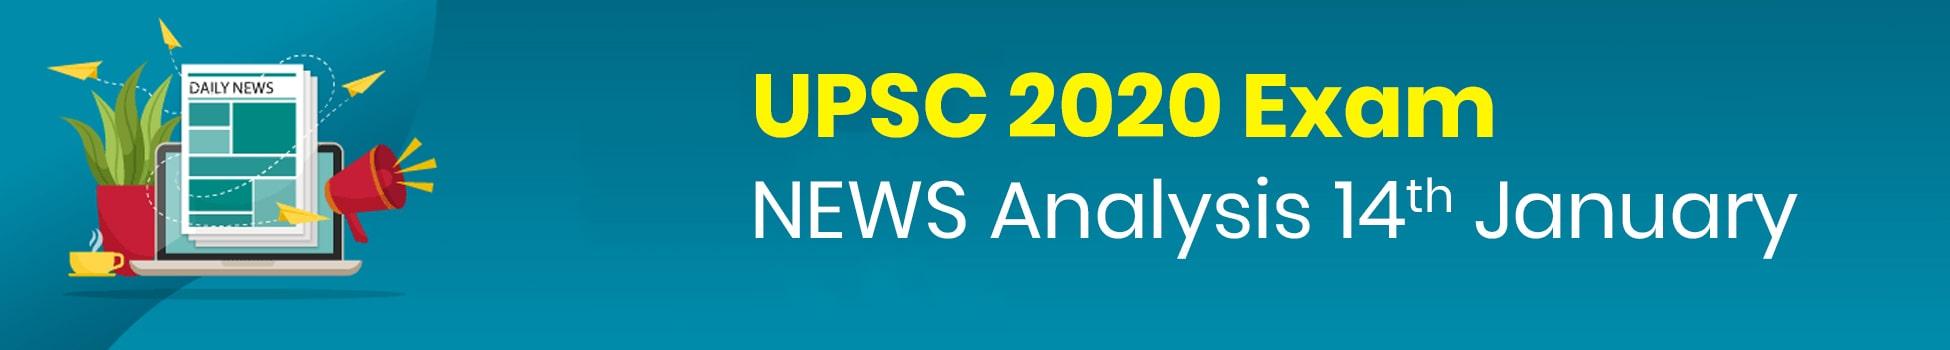 UPSC 2020 Exam - NEWS Analysis 14th January